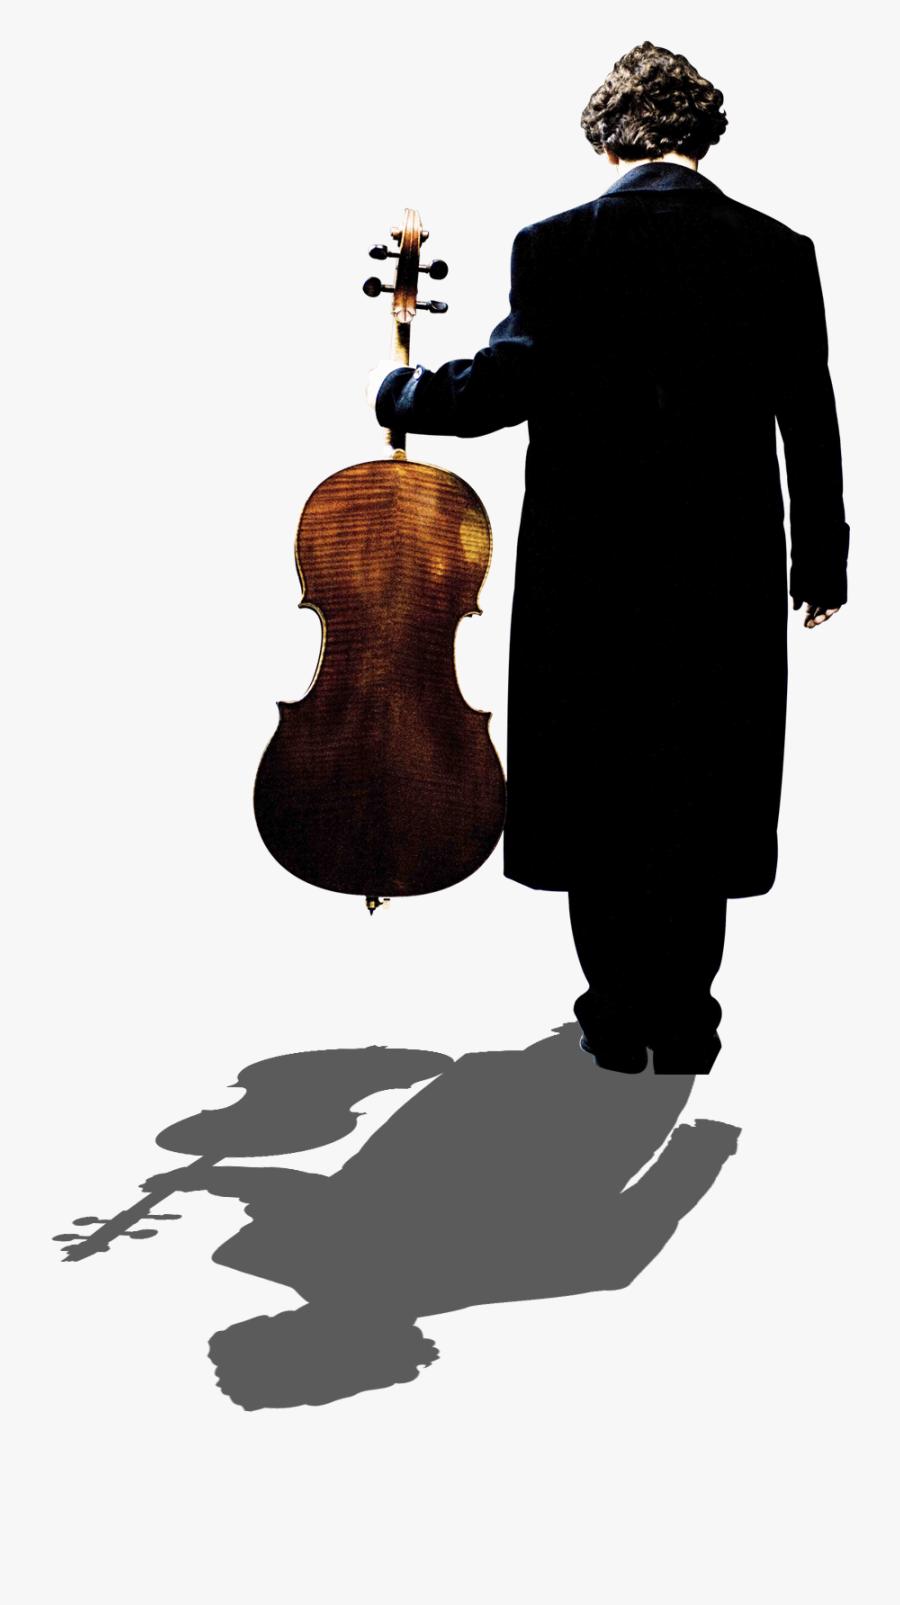 Clip Art Cello Wallpaper Silhouette Free Transparent